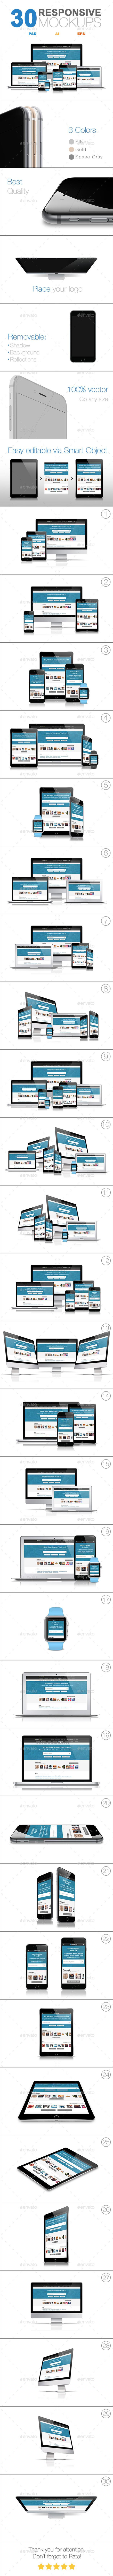 GraphicRiver 30 Responsive Mockups 10932368